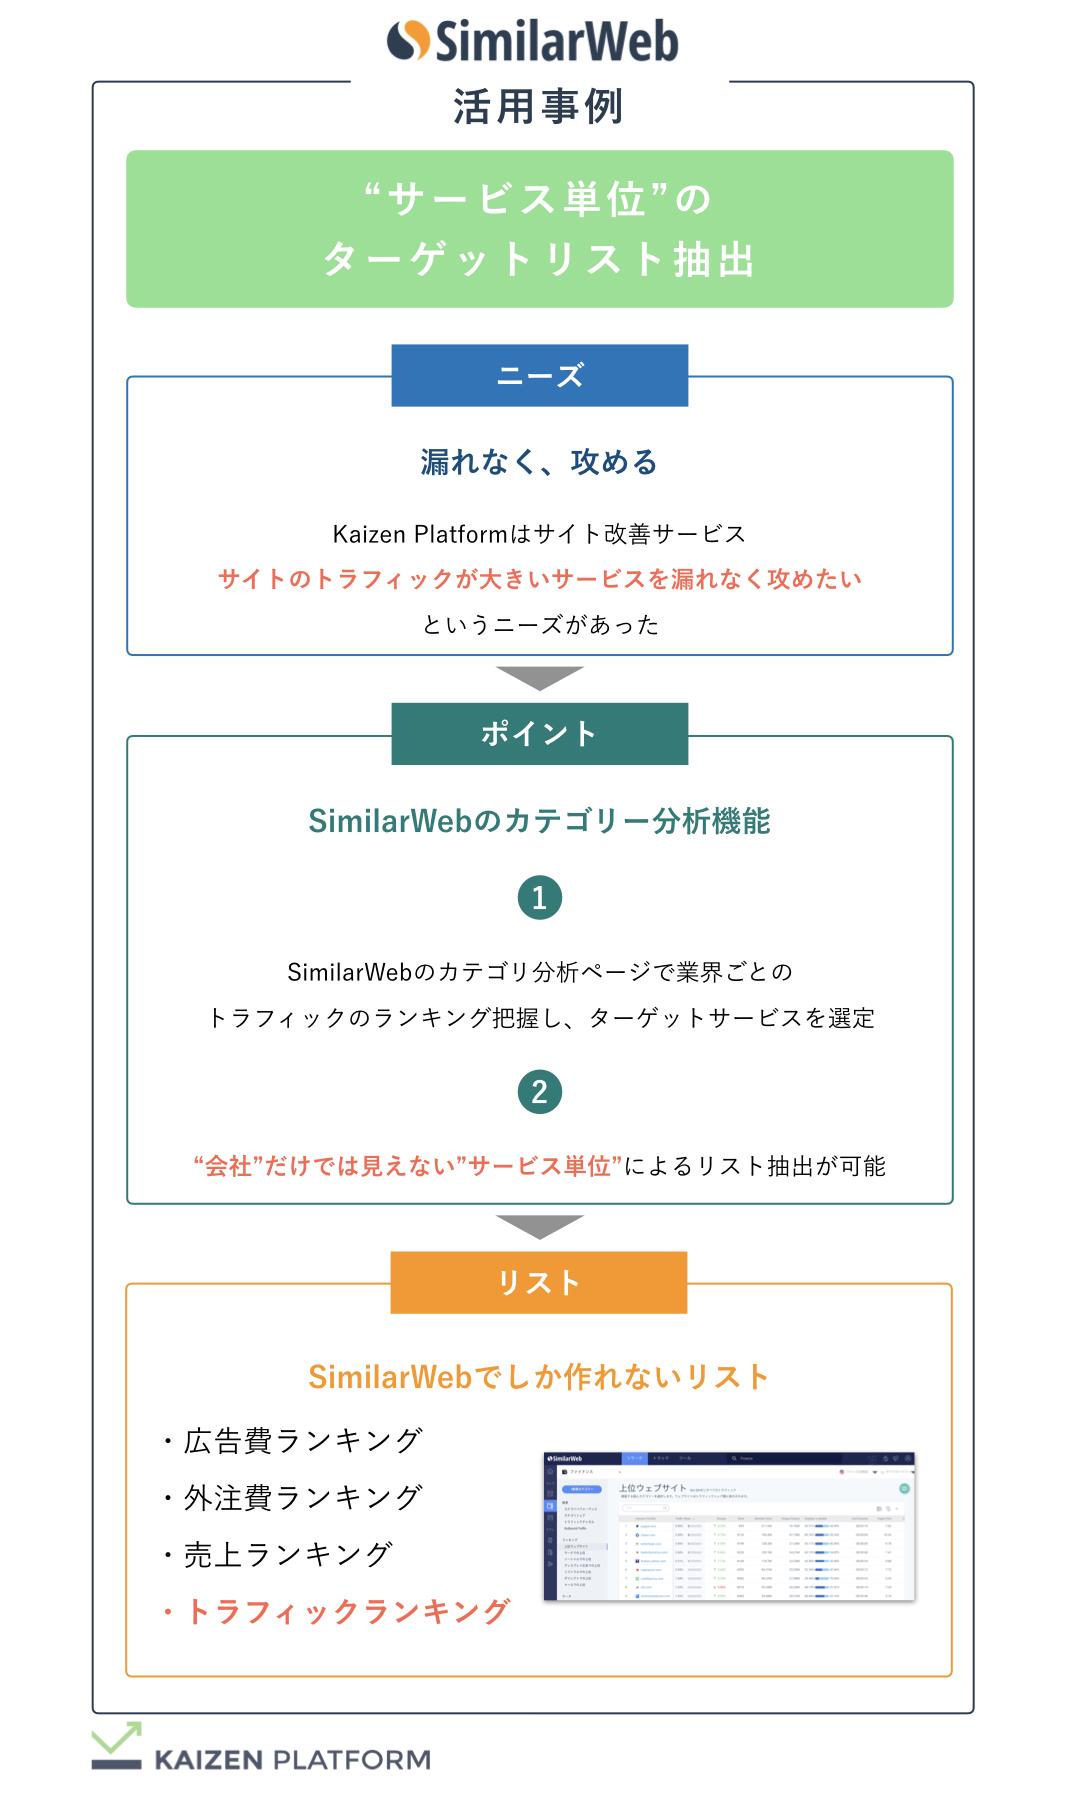 Kaizen Platform サービス単位のターゲットリスト抽出